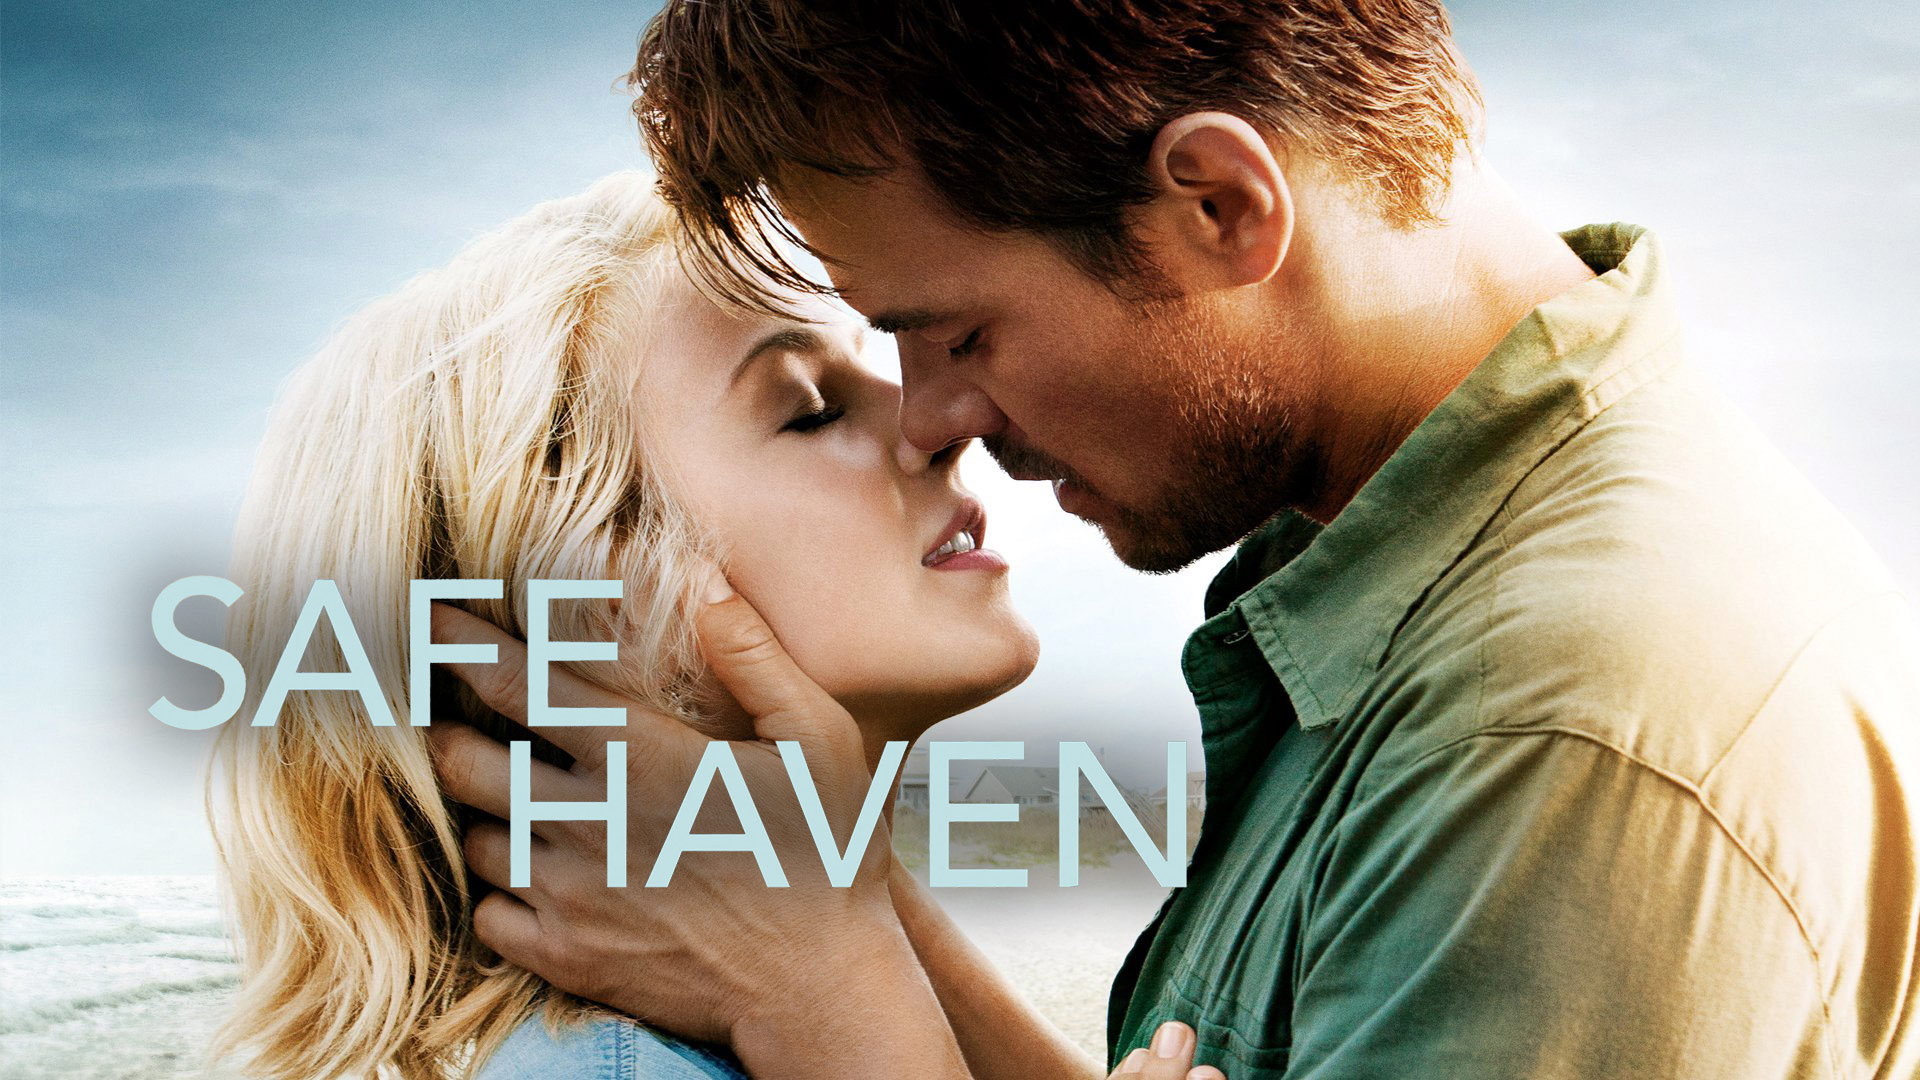 safe haven full movie online free